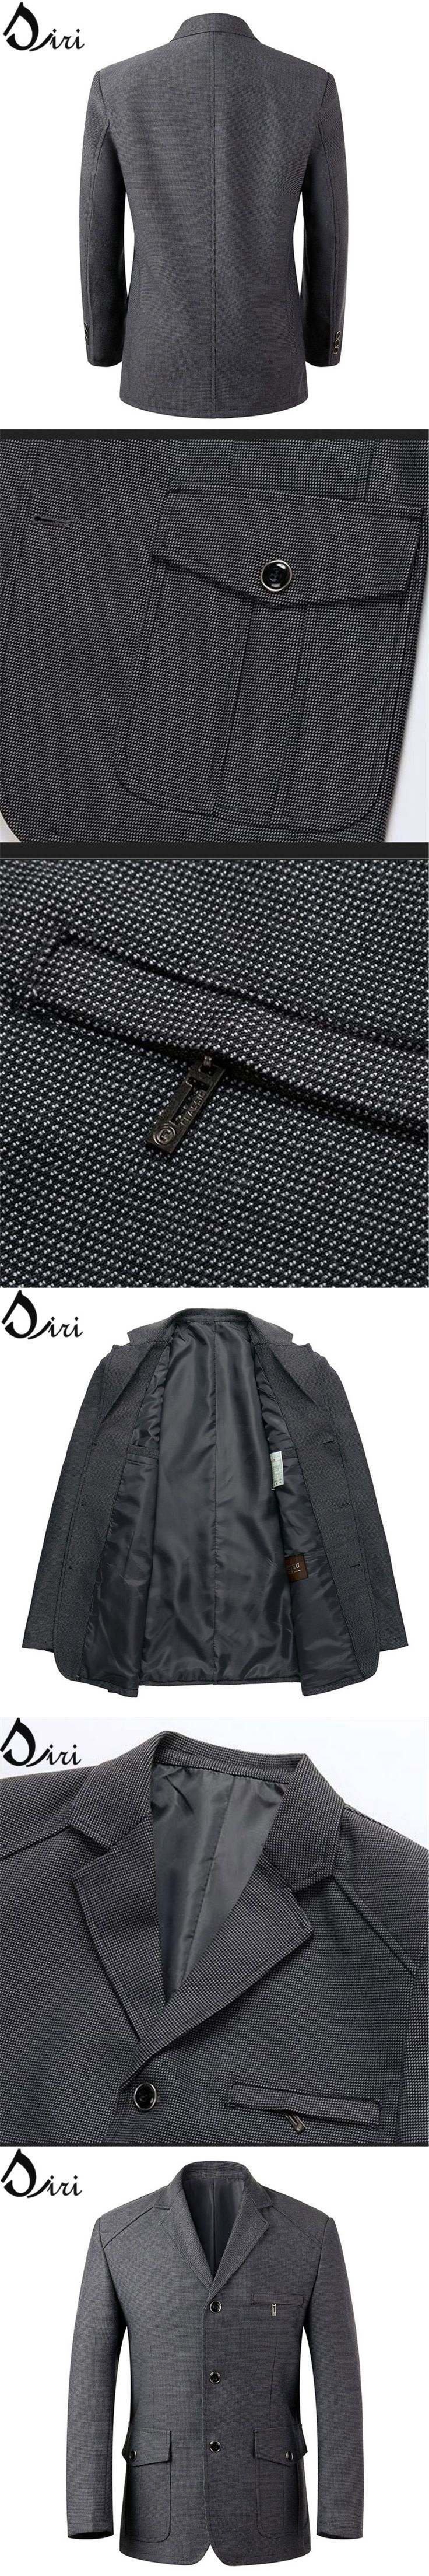 TOP Quality! Famous Brand Formal Jackets Blazers Men ,Wedding Dress, Men's Business Suit, Office Suit Jacket, Gray Stage Clothes